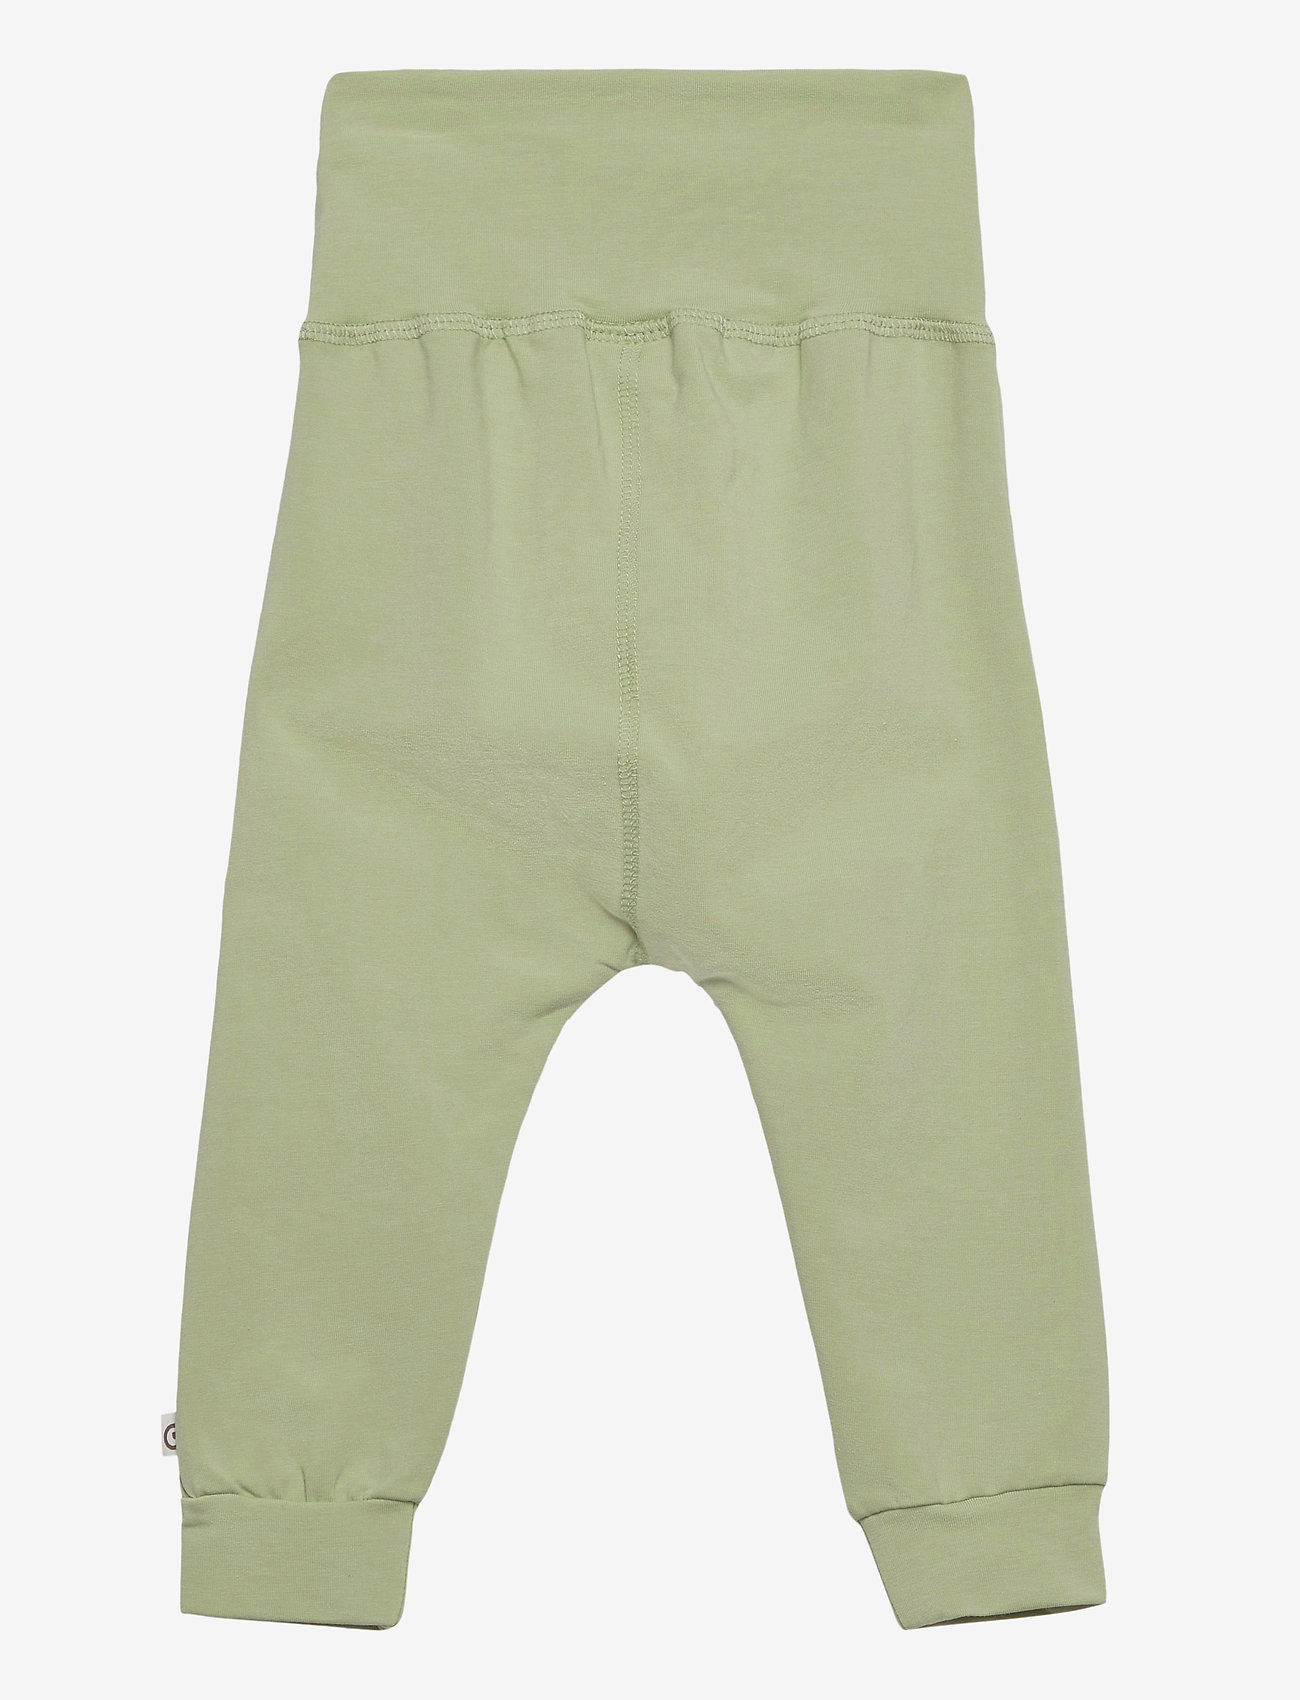 Müsli by Green Cotton - Cozy me pants - trousers - pale moss - 1